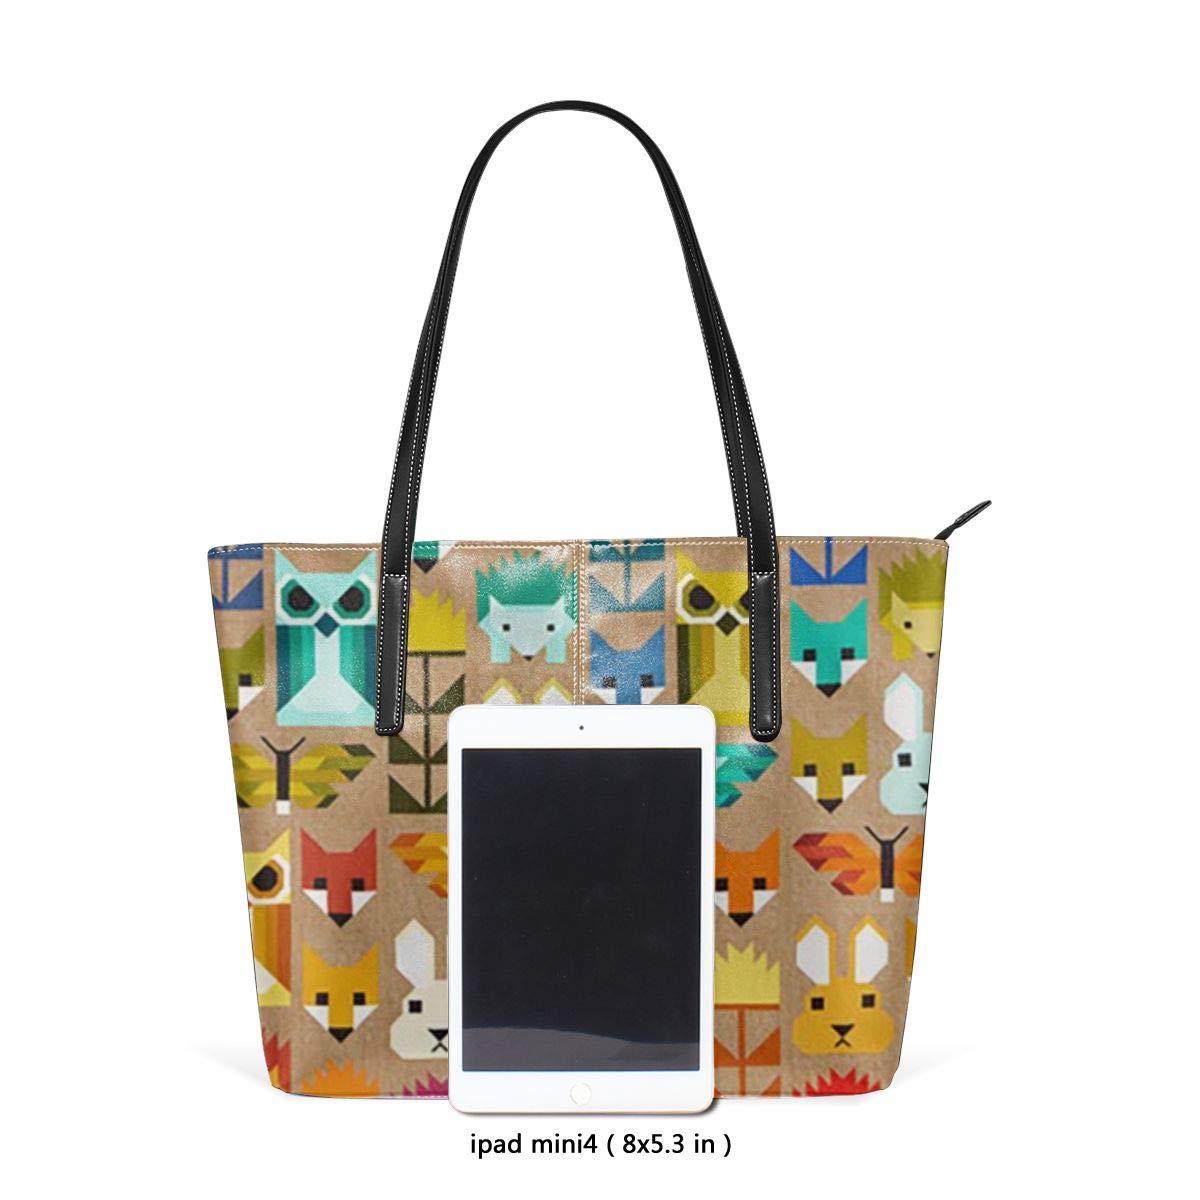 2b57b75e65f1 Amazon.com: JIAQI Women's Stylish Casual Tote Bag Canvas Travel Bags ...